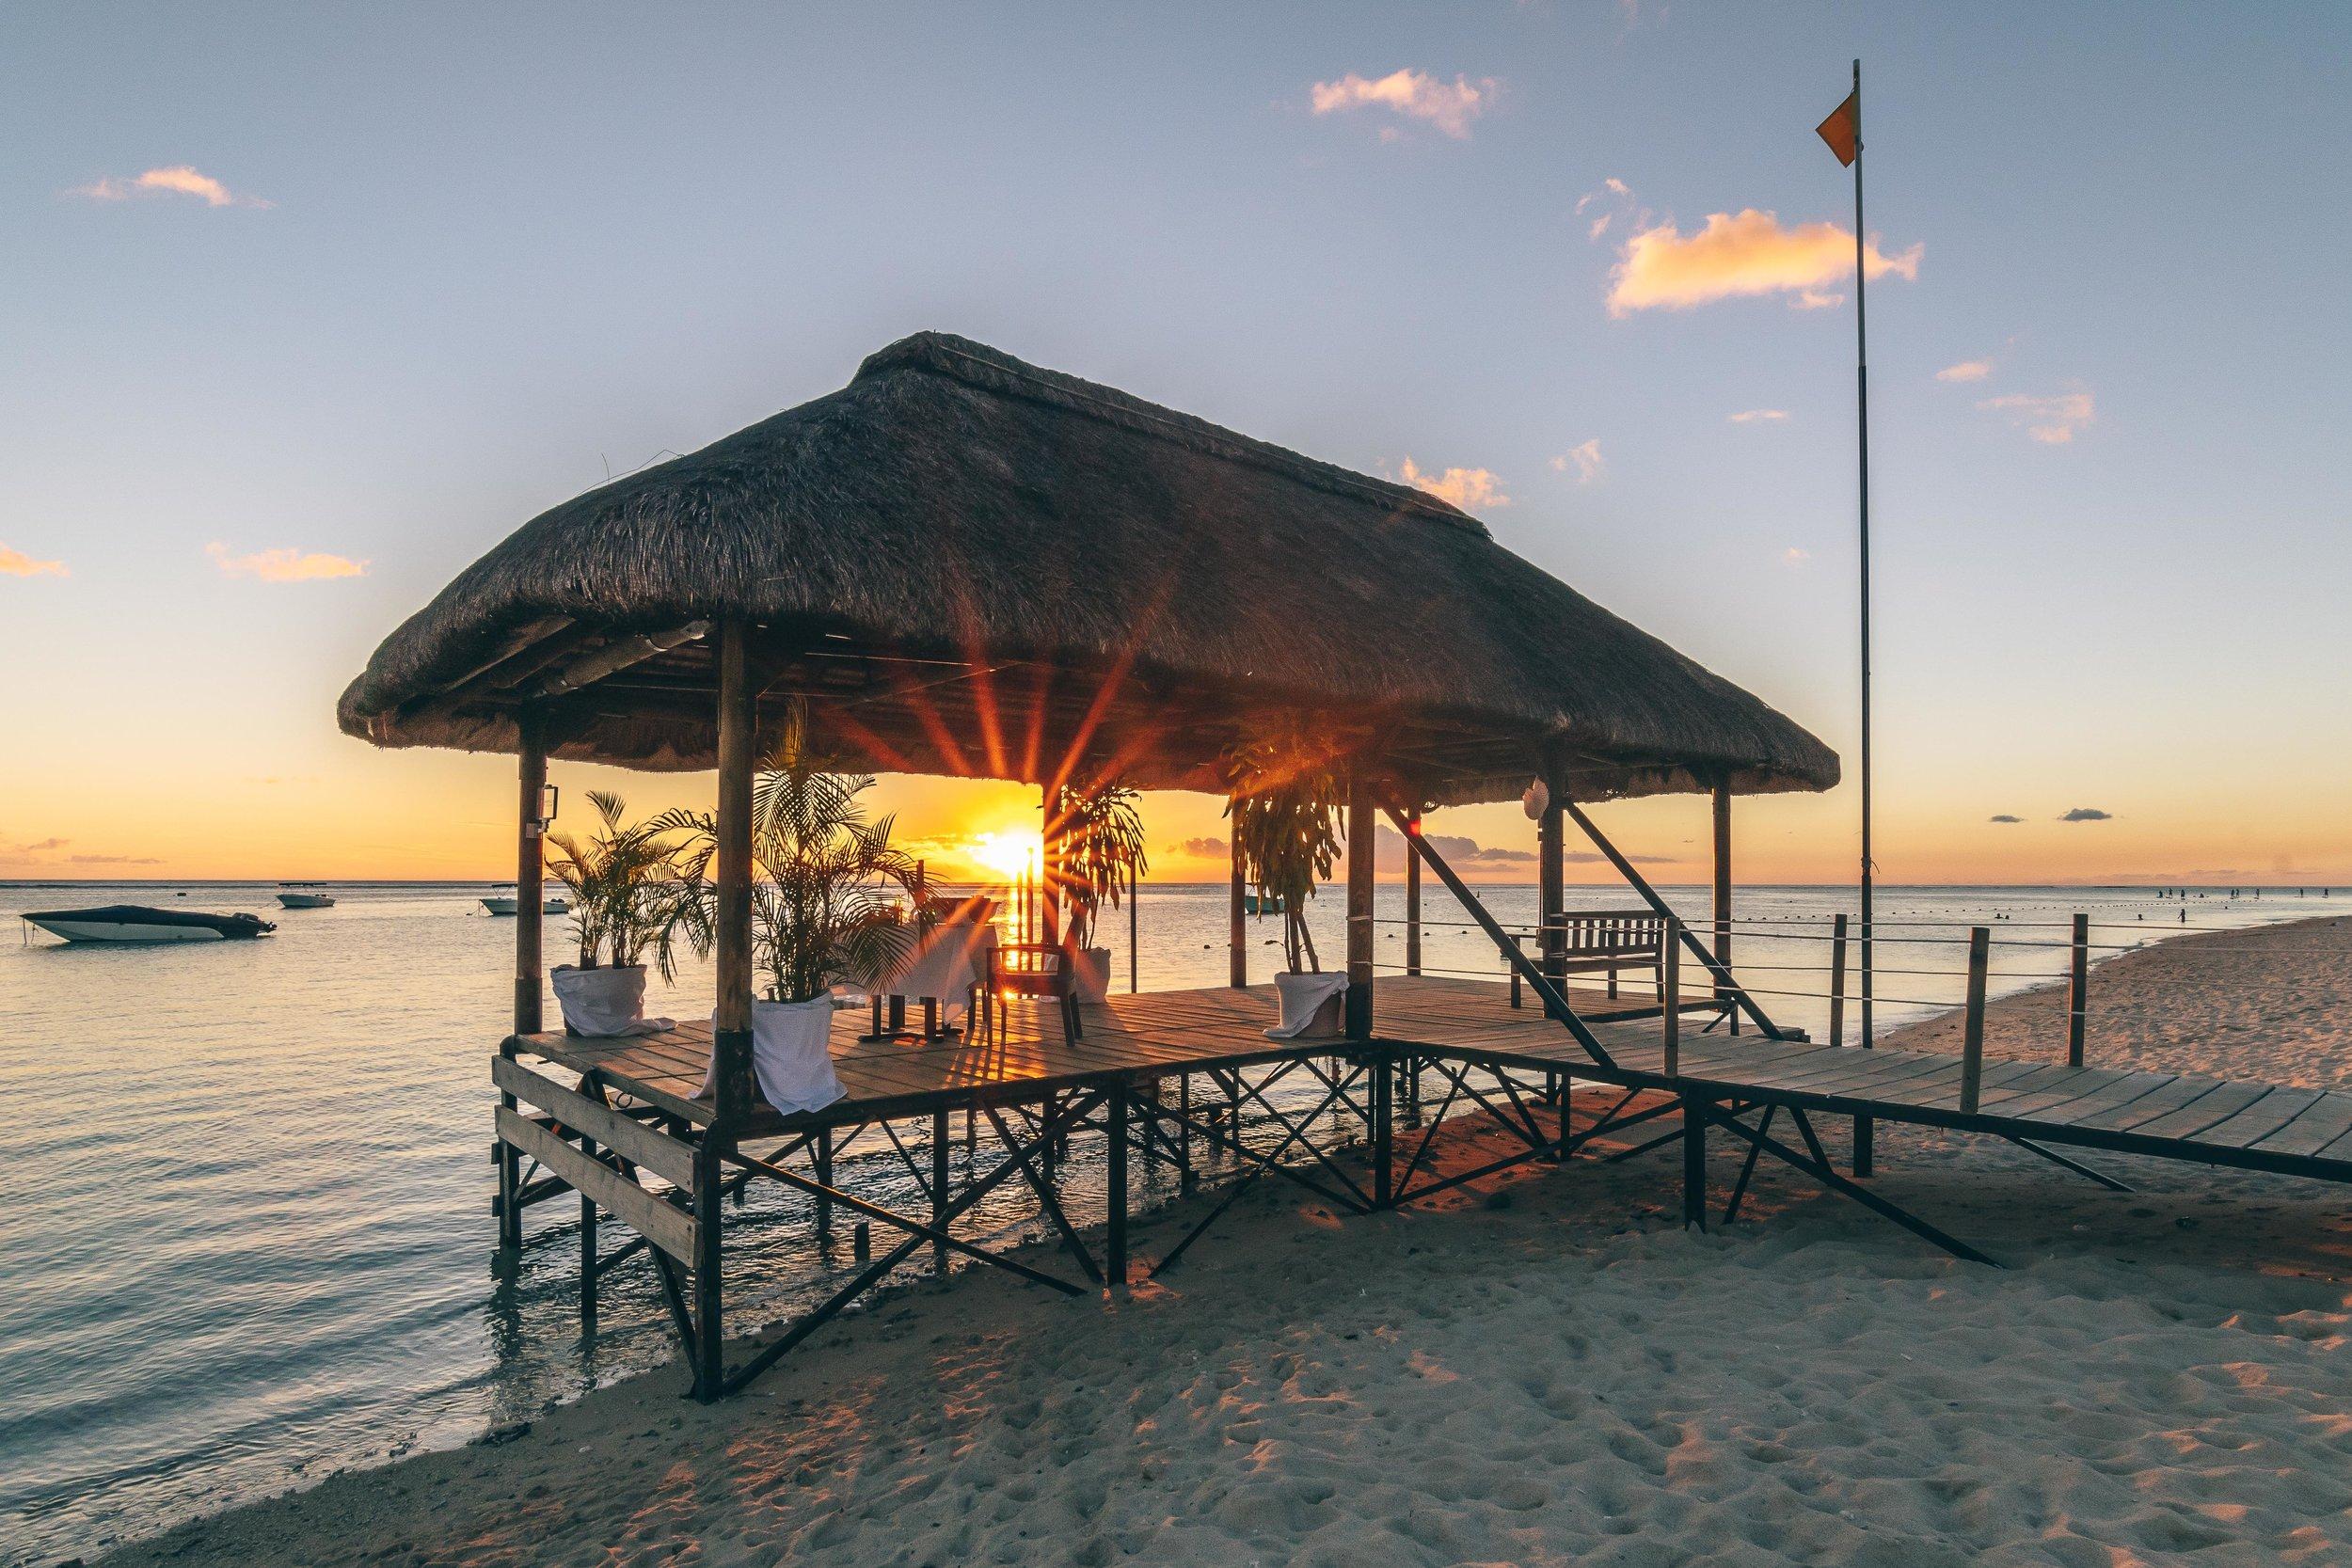 La Pirogue Mauritius - Sunresorts-16.jpg